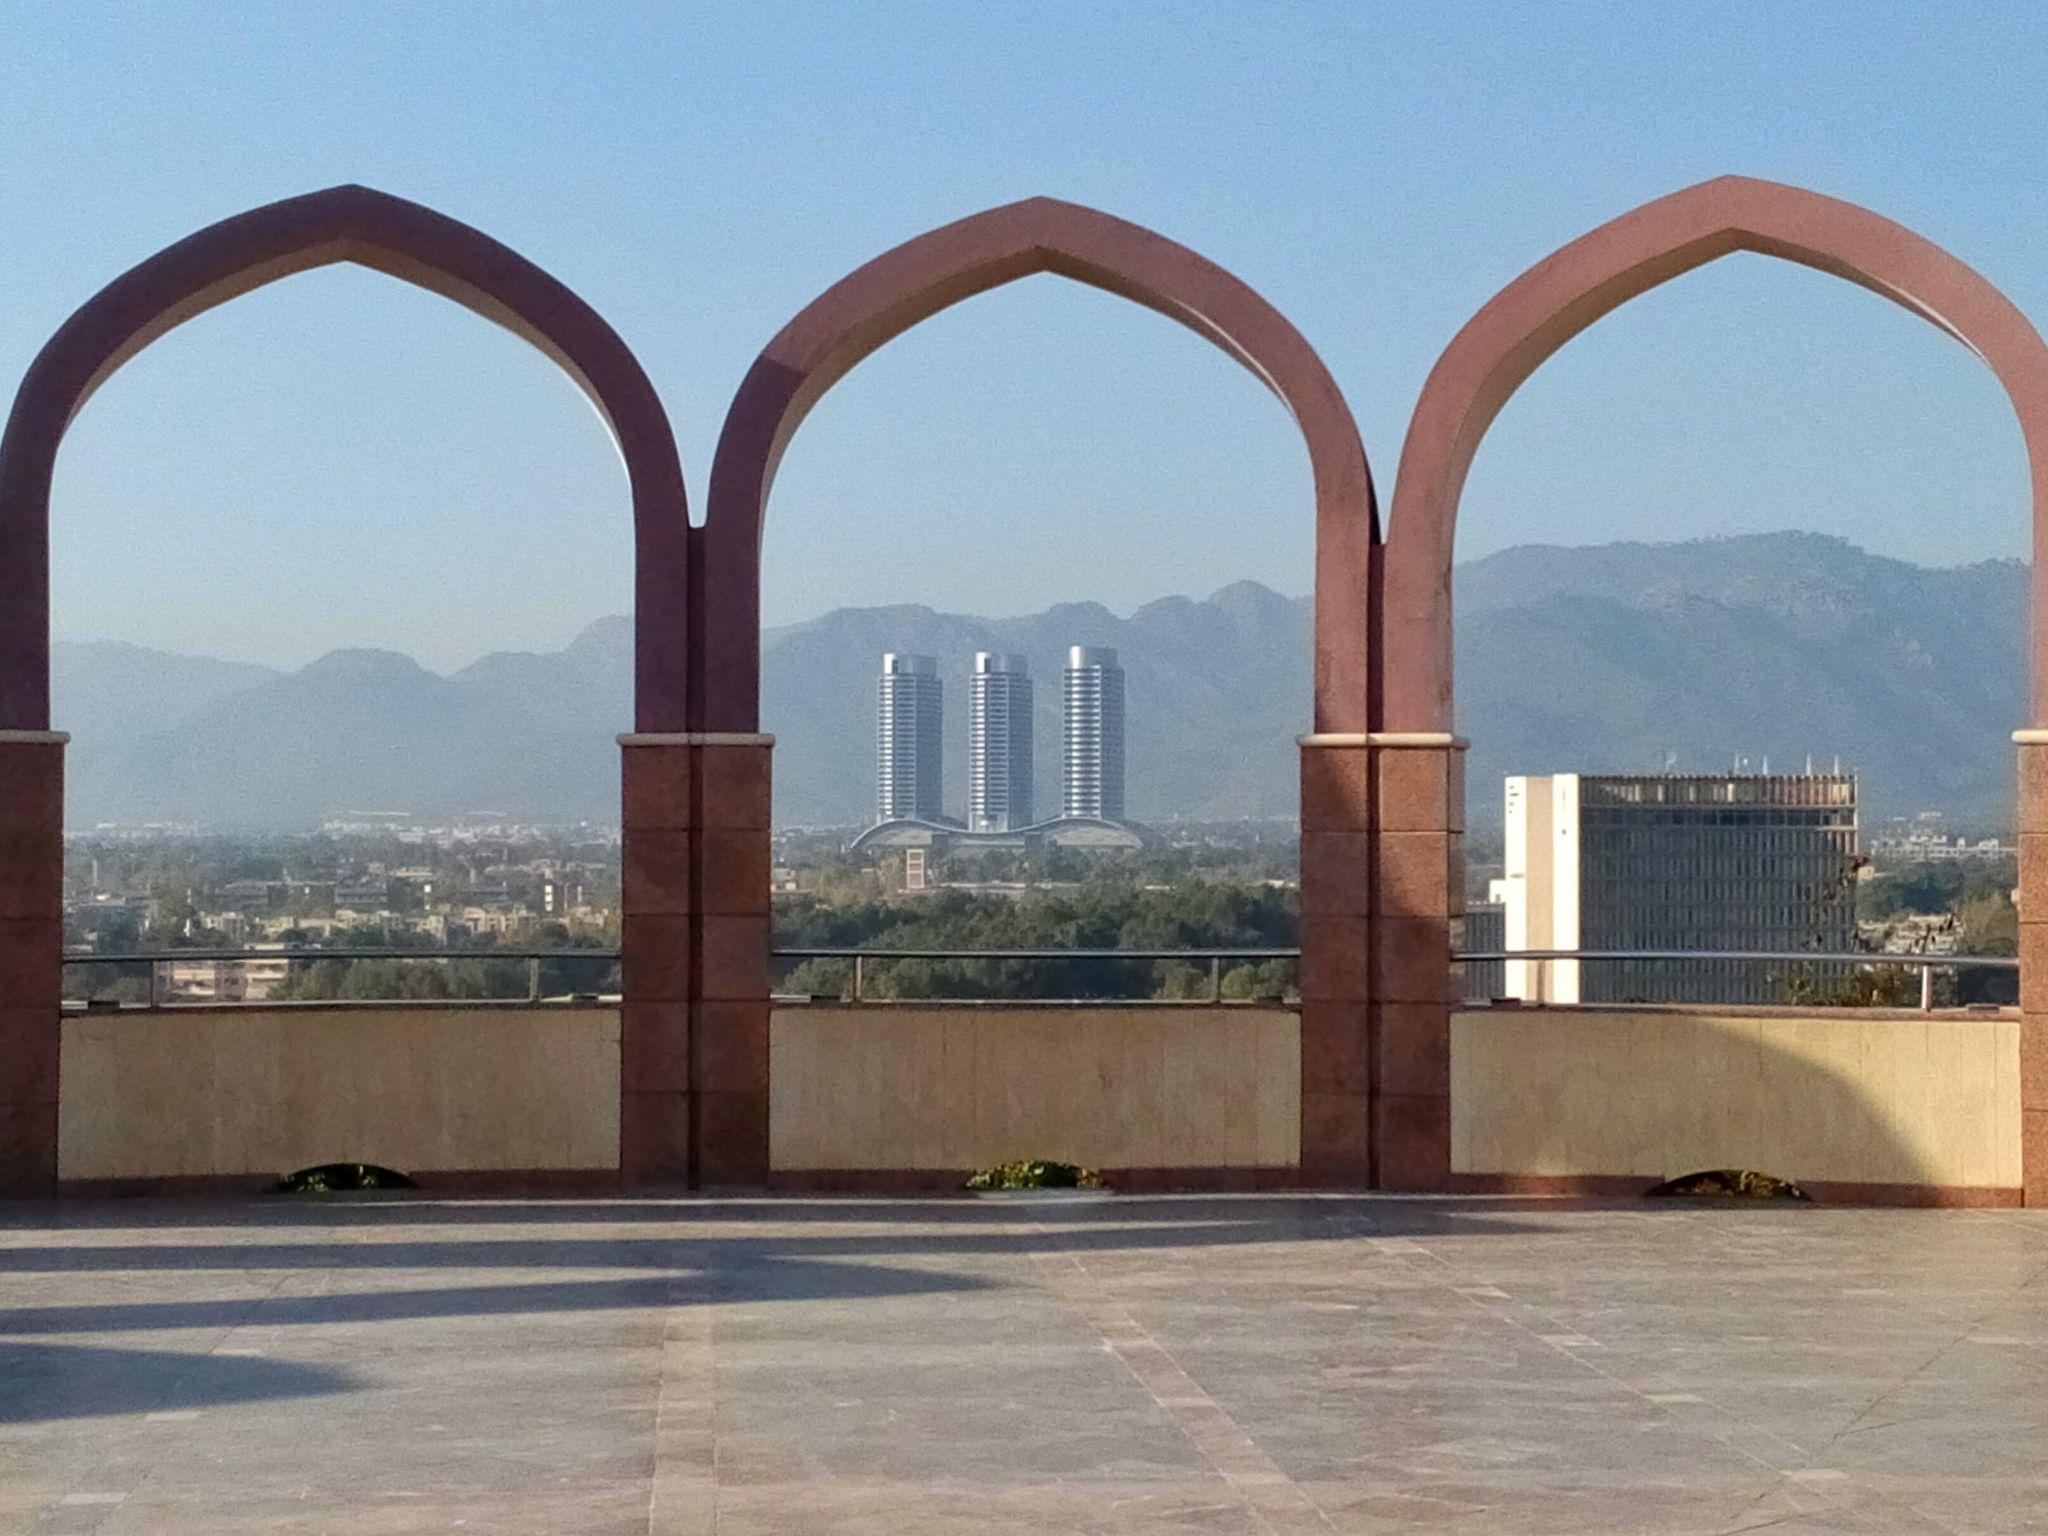 Widok na centrum handlowe Centaurus z pomnika Pakistanu